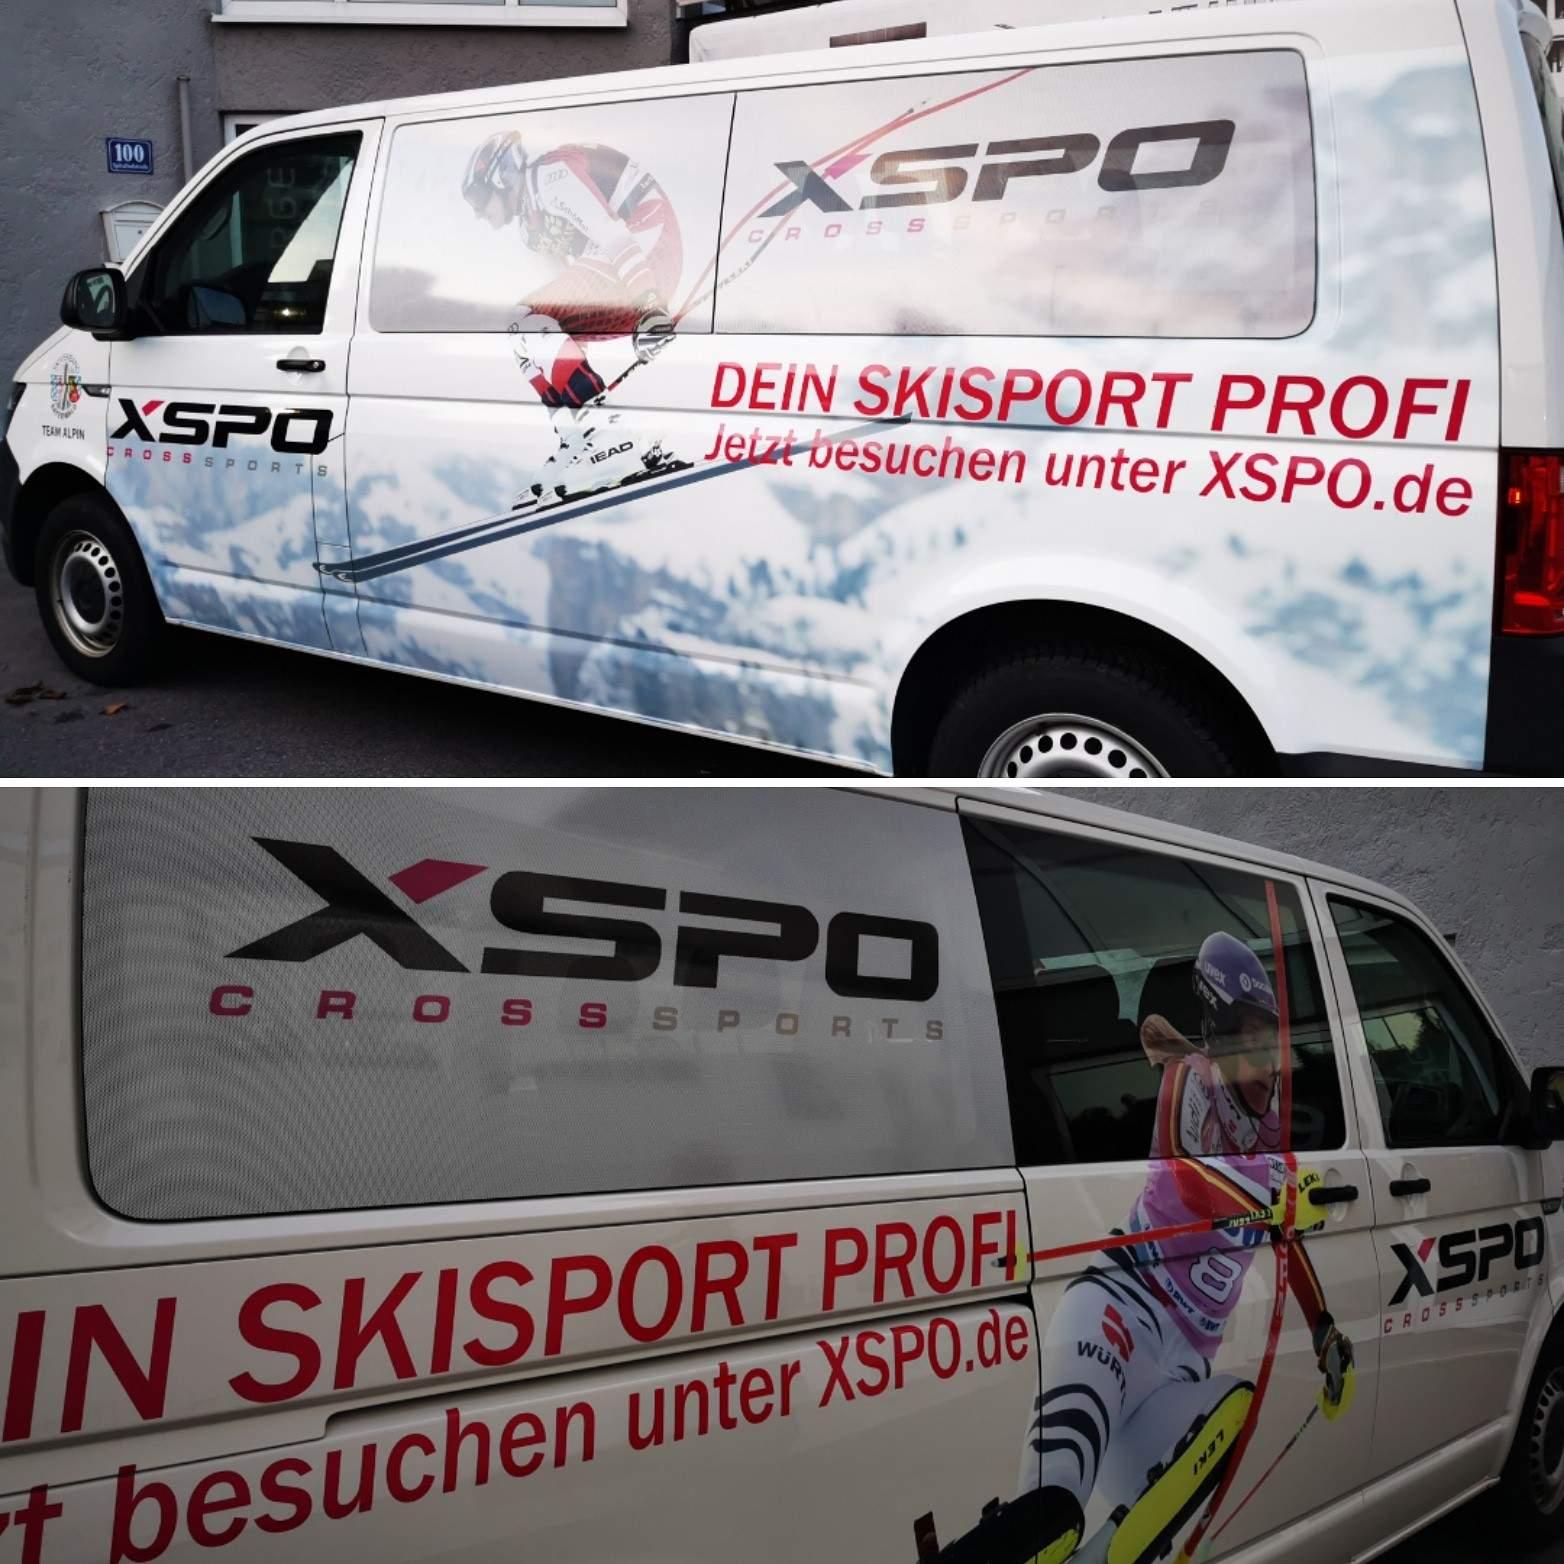 Bus Sponsoring XSPO